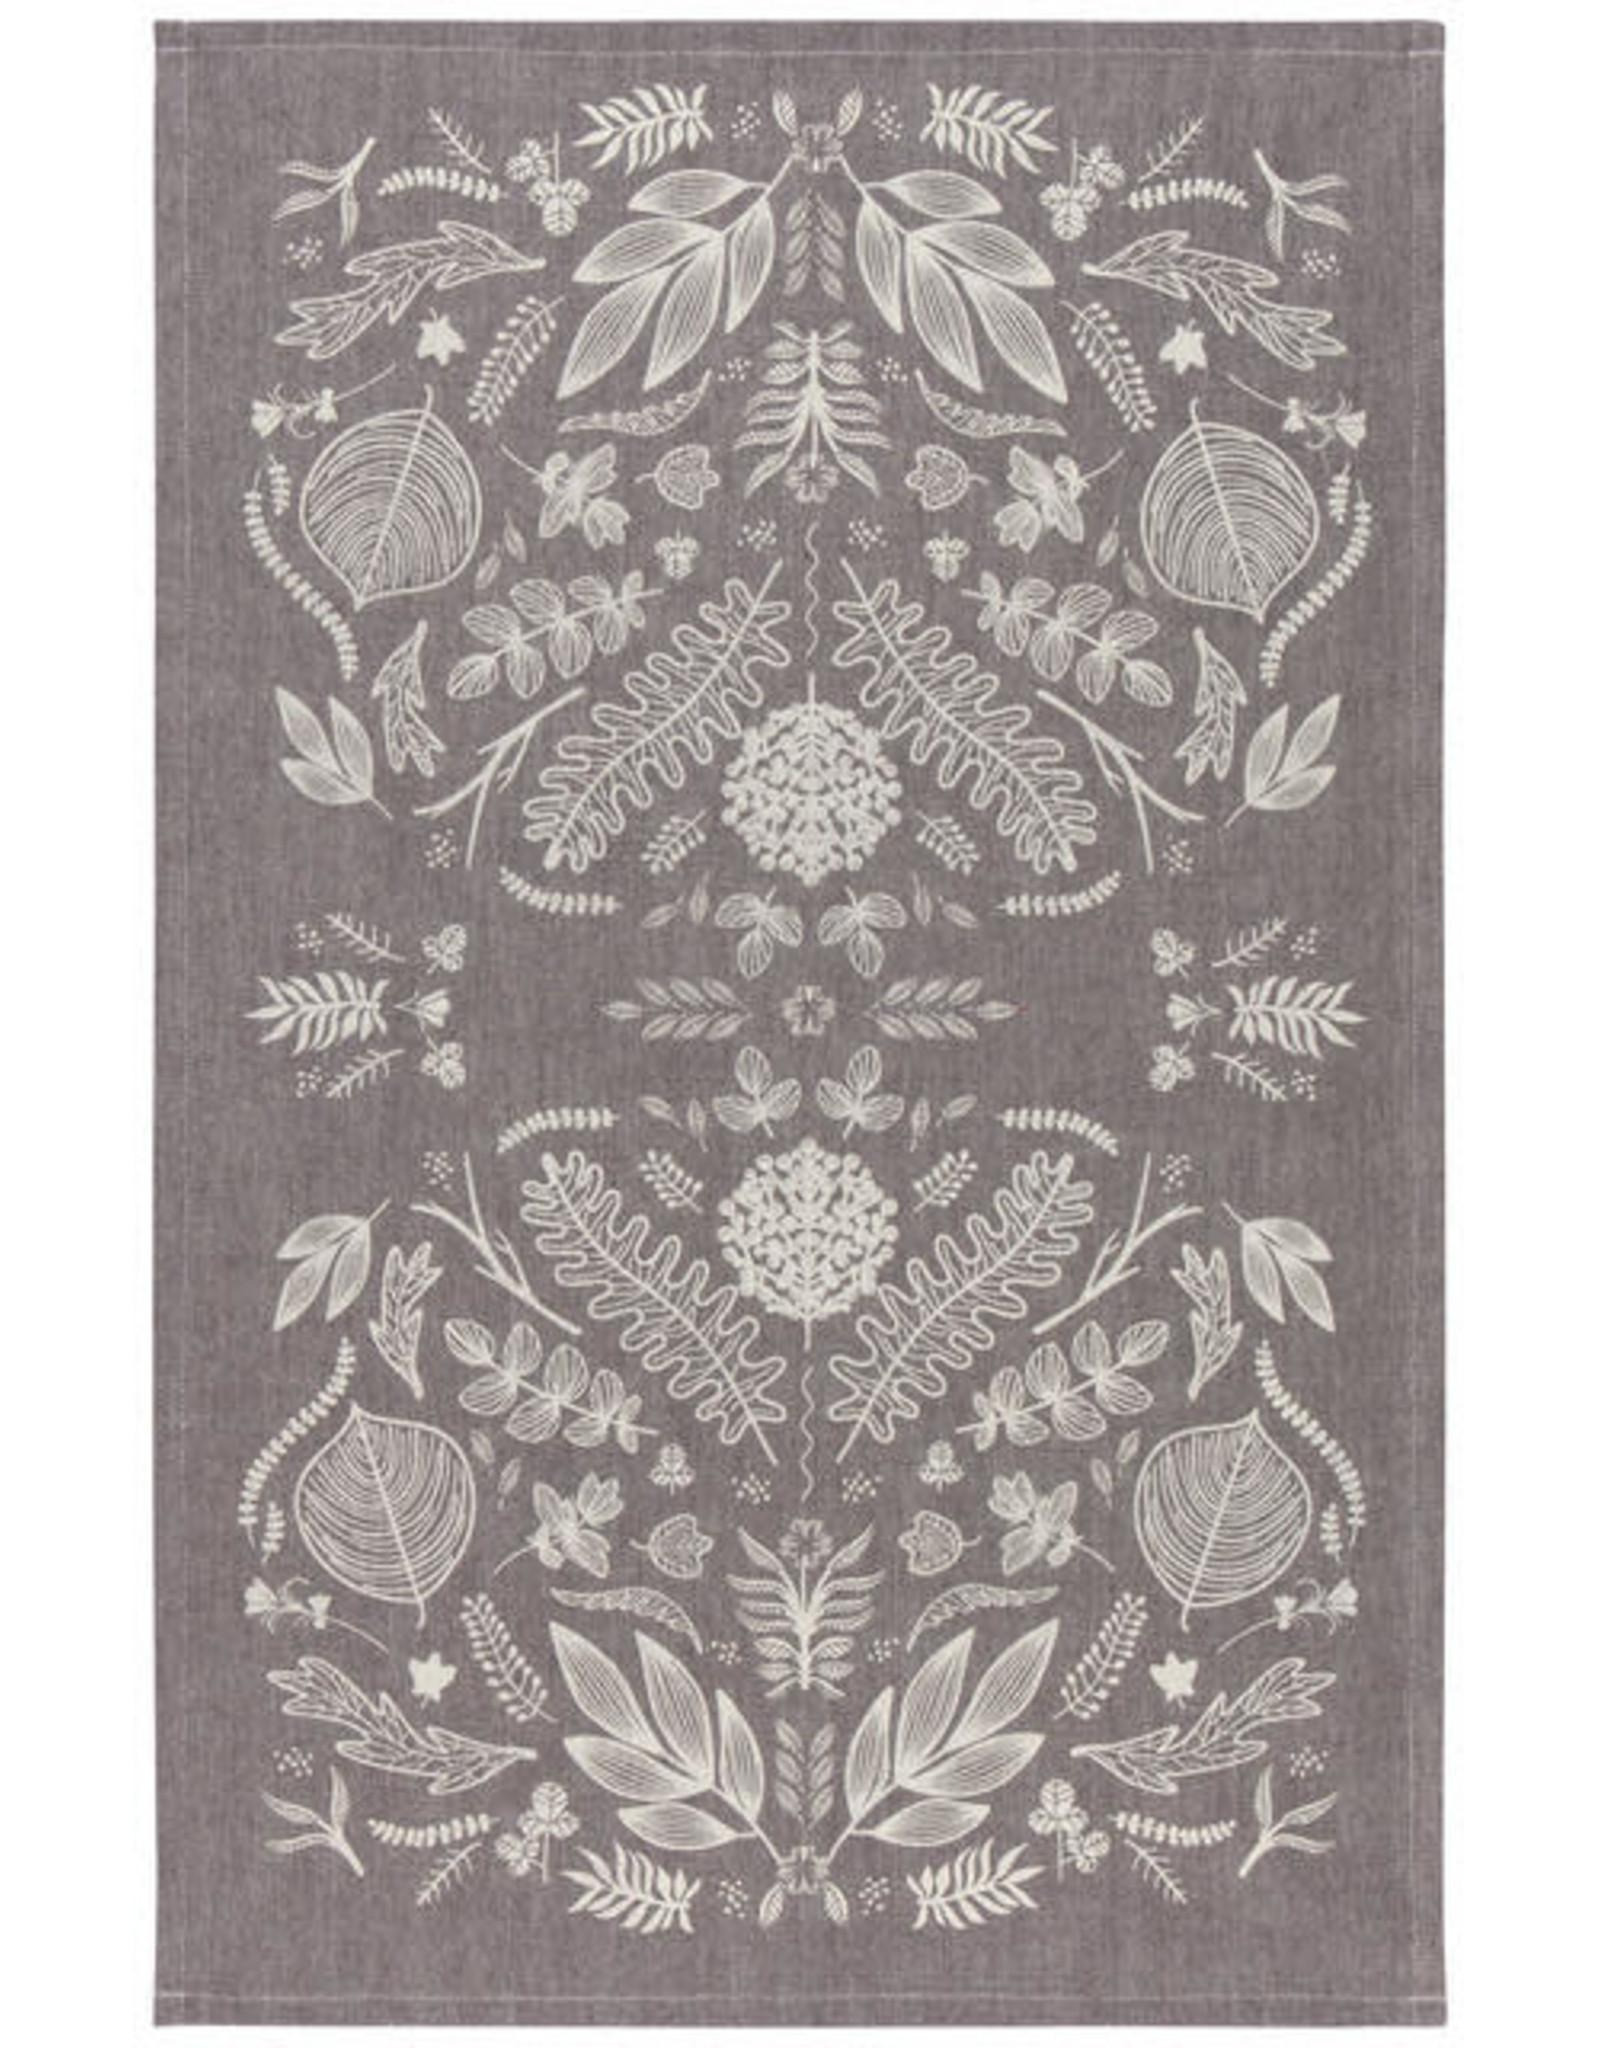 Chambray  Tea Towel- Laurel